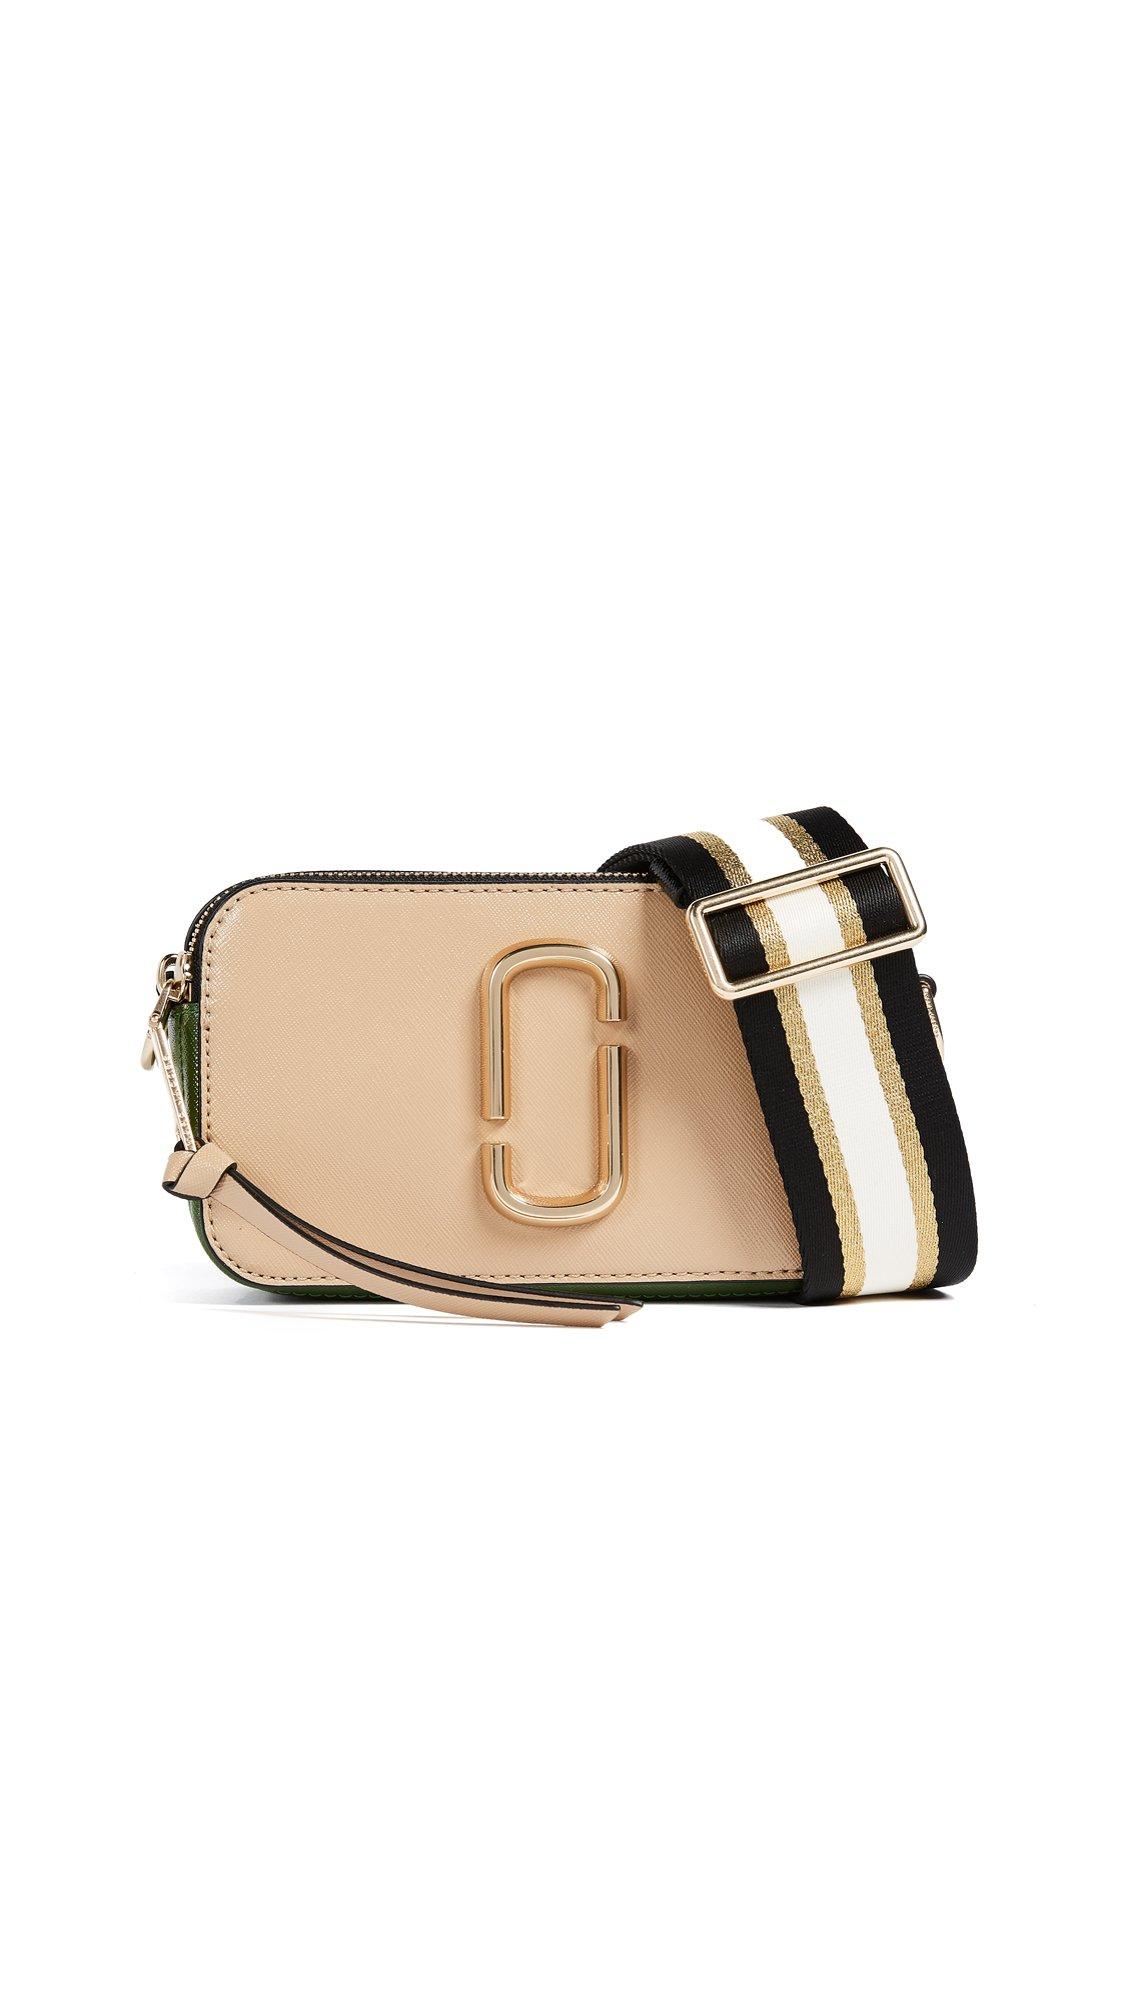 Marc Jacobs Women's Snapshot Cross Body Bag, Sandcastle Multi, One Size